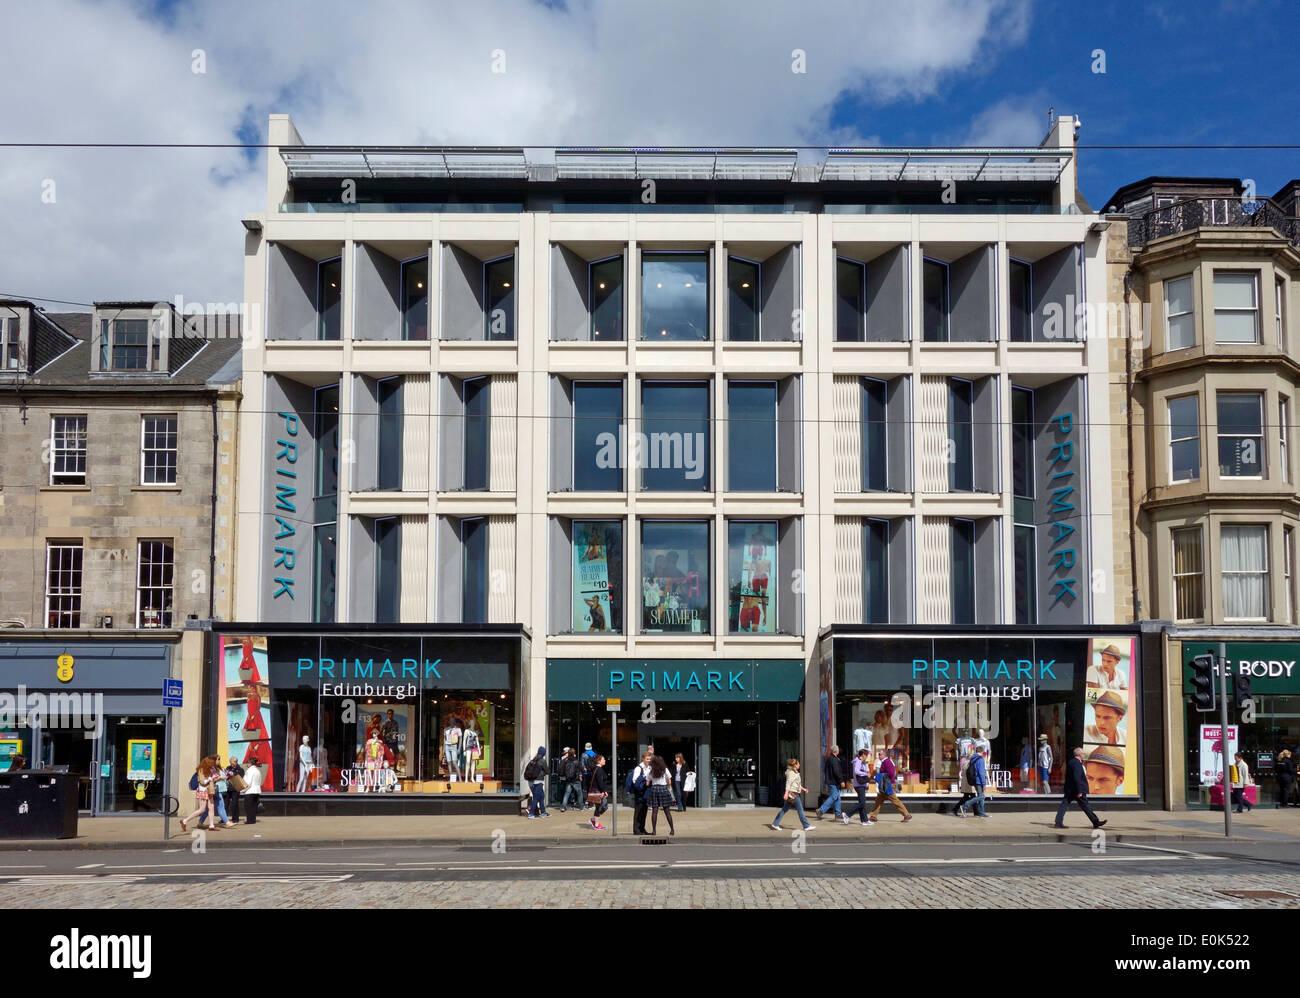 University of edinburgh clothing store